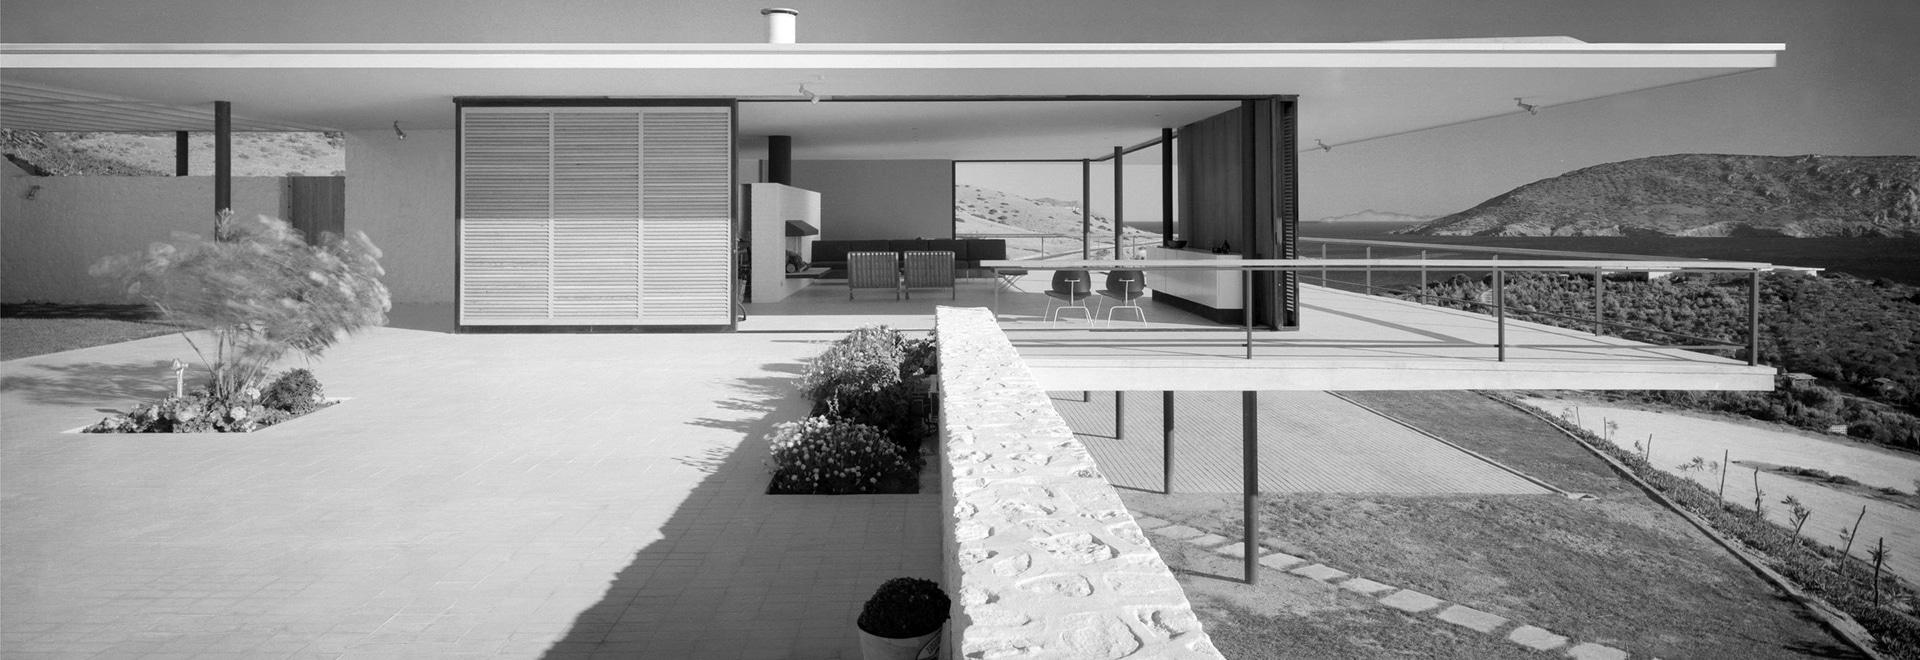 The Inspirational Designs of Greek Architect Nicos Valsamakis